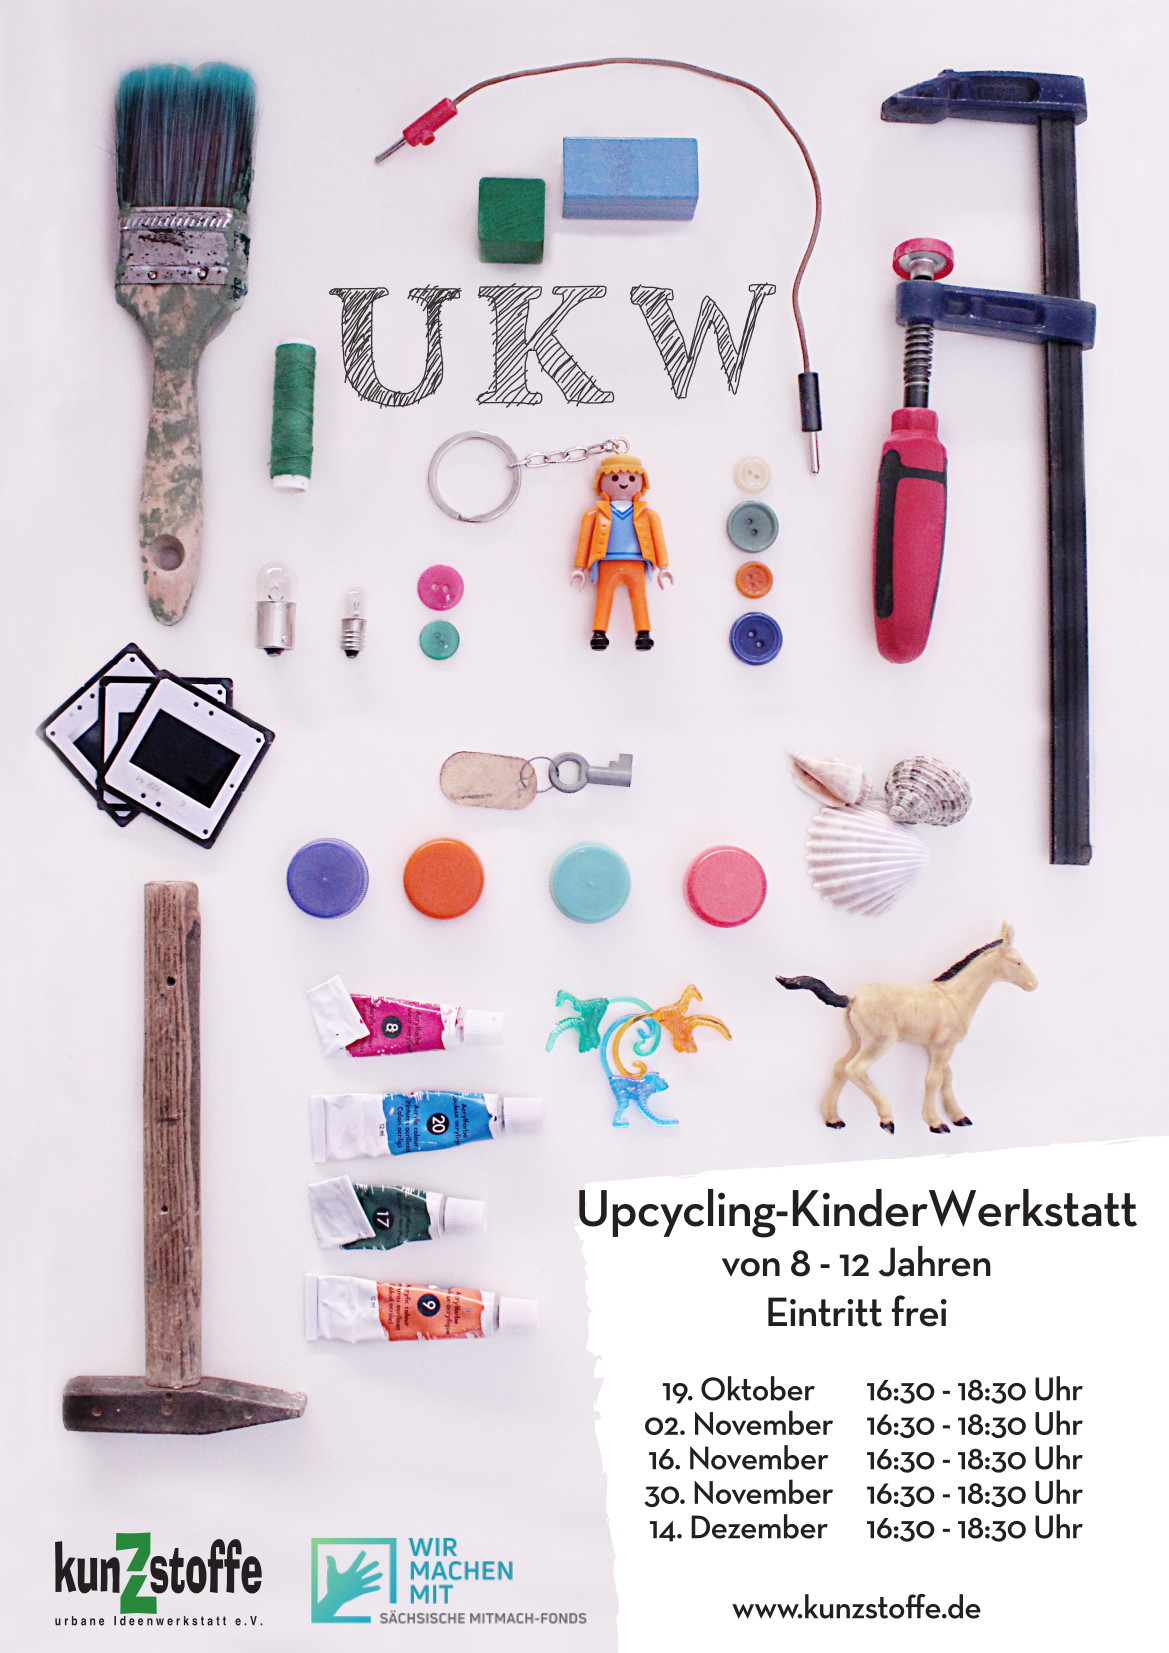 UKW – Upcycling KinderWerkstatt – Fällt leider aus!